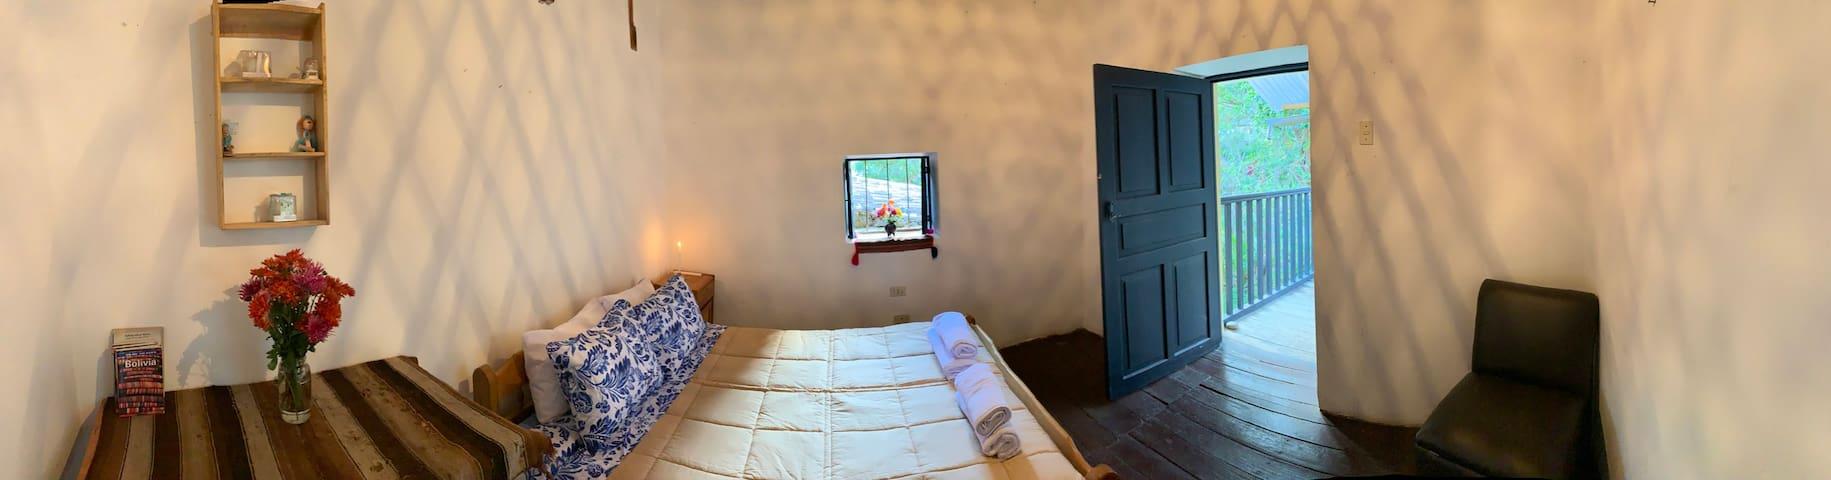 Queen Bed with Balcony at El Canchon